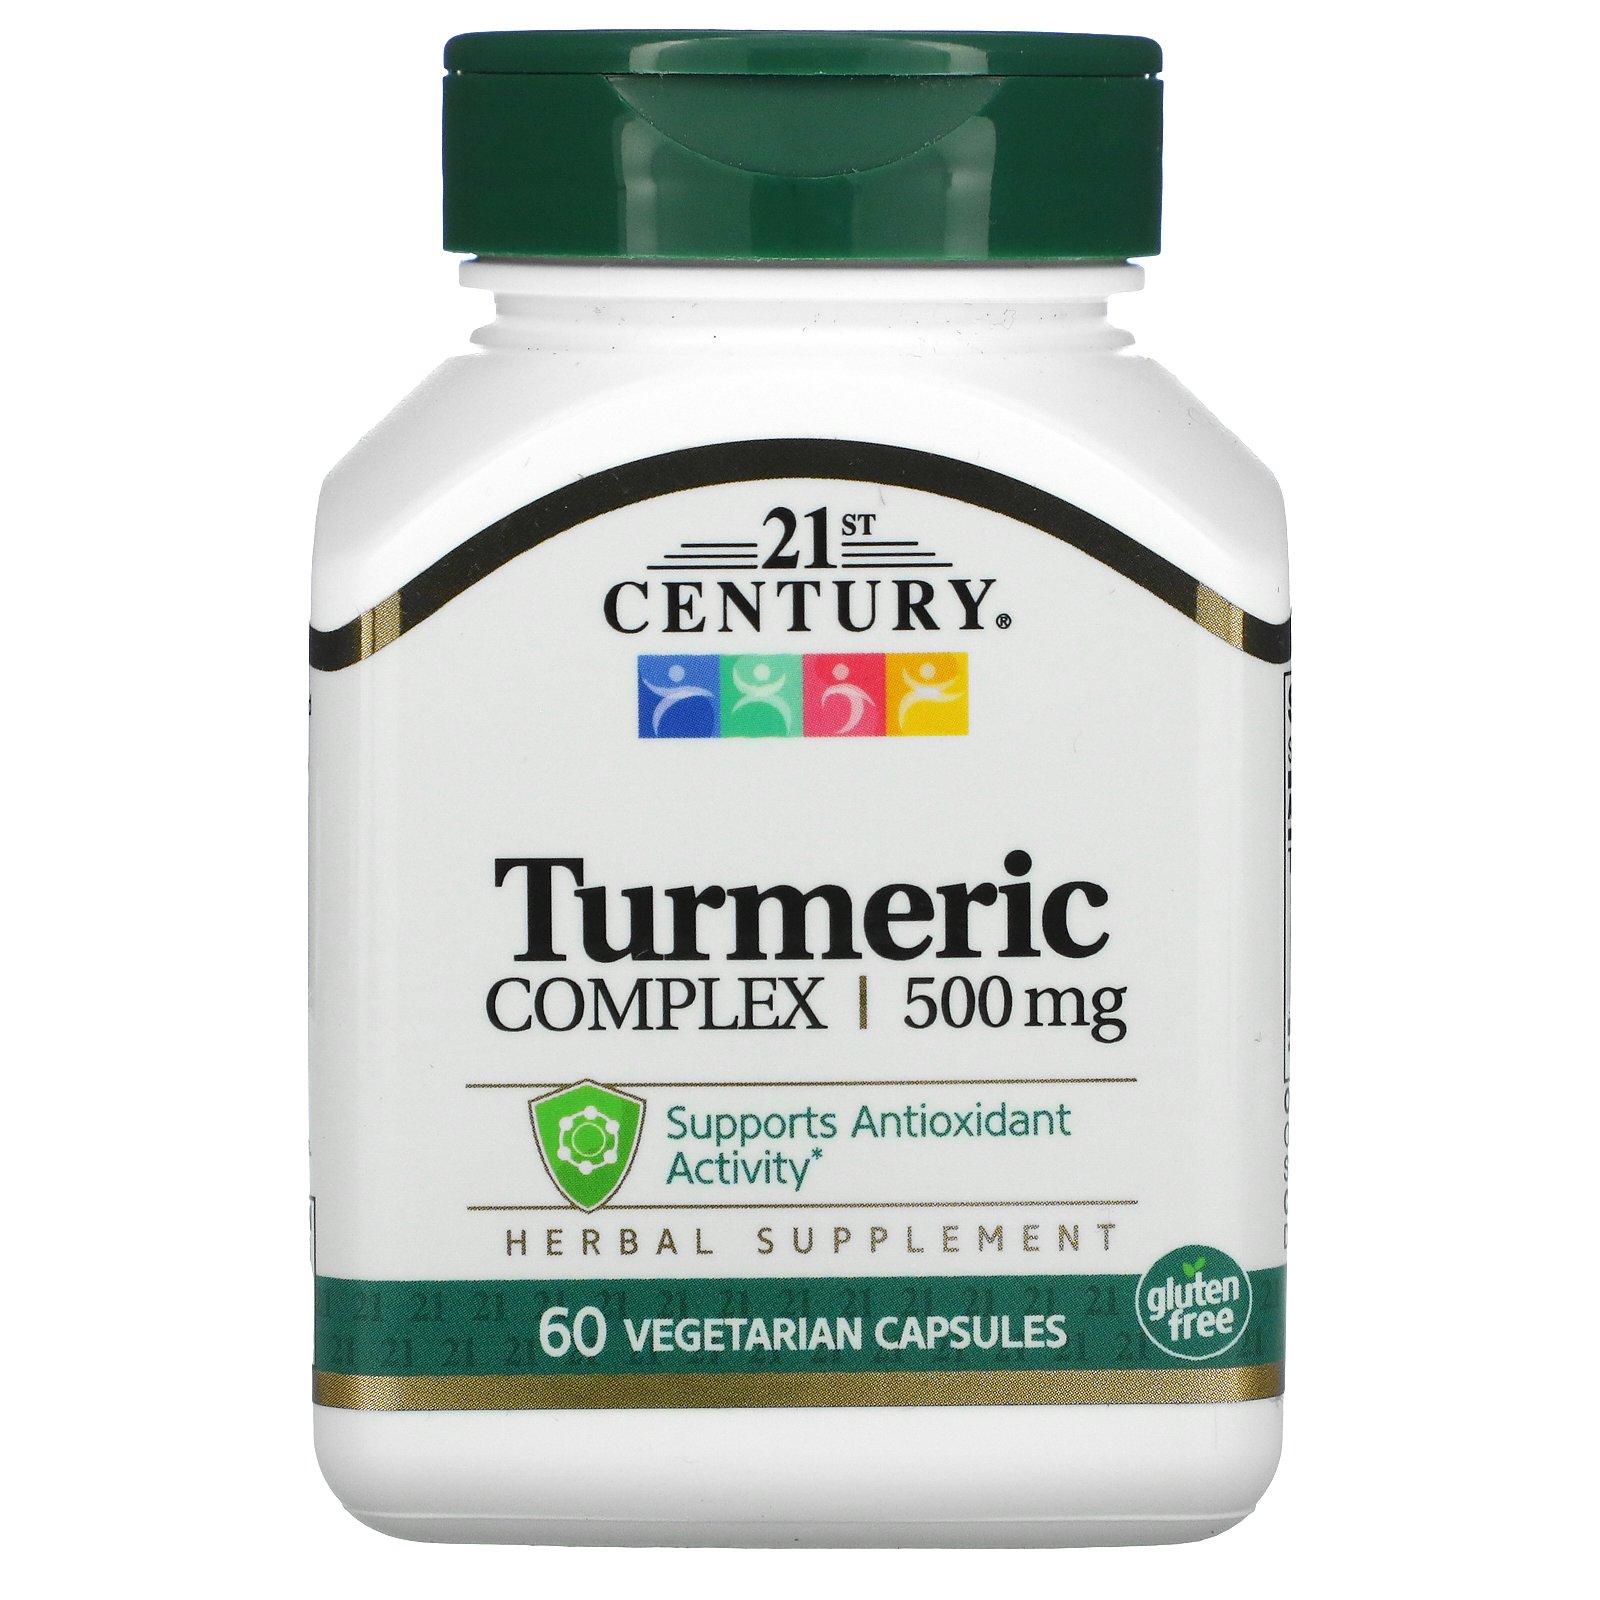 21st Century, Turmeric Complex, 500 mg, 60 Vegetarian Capsules